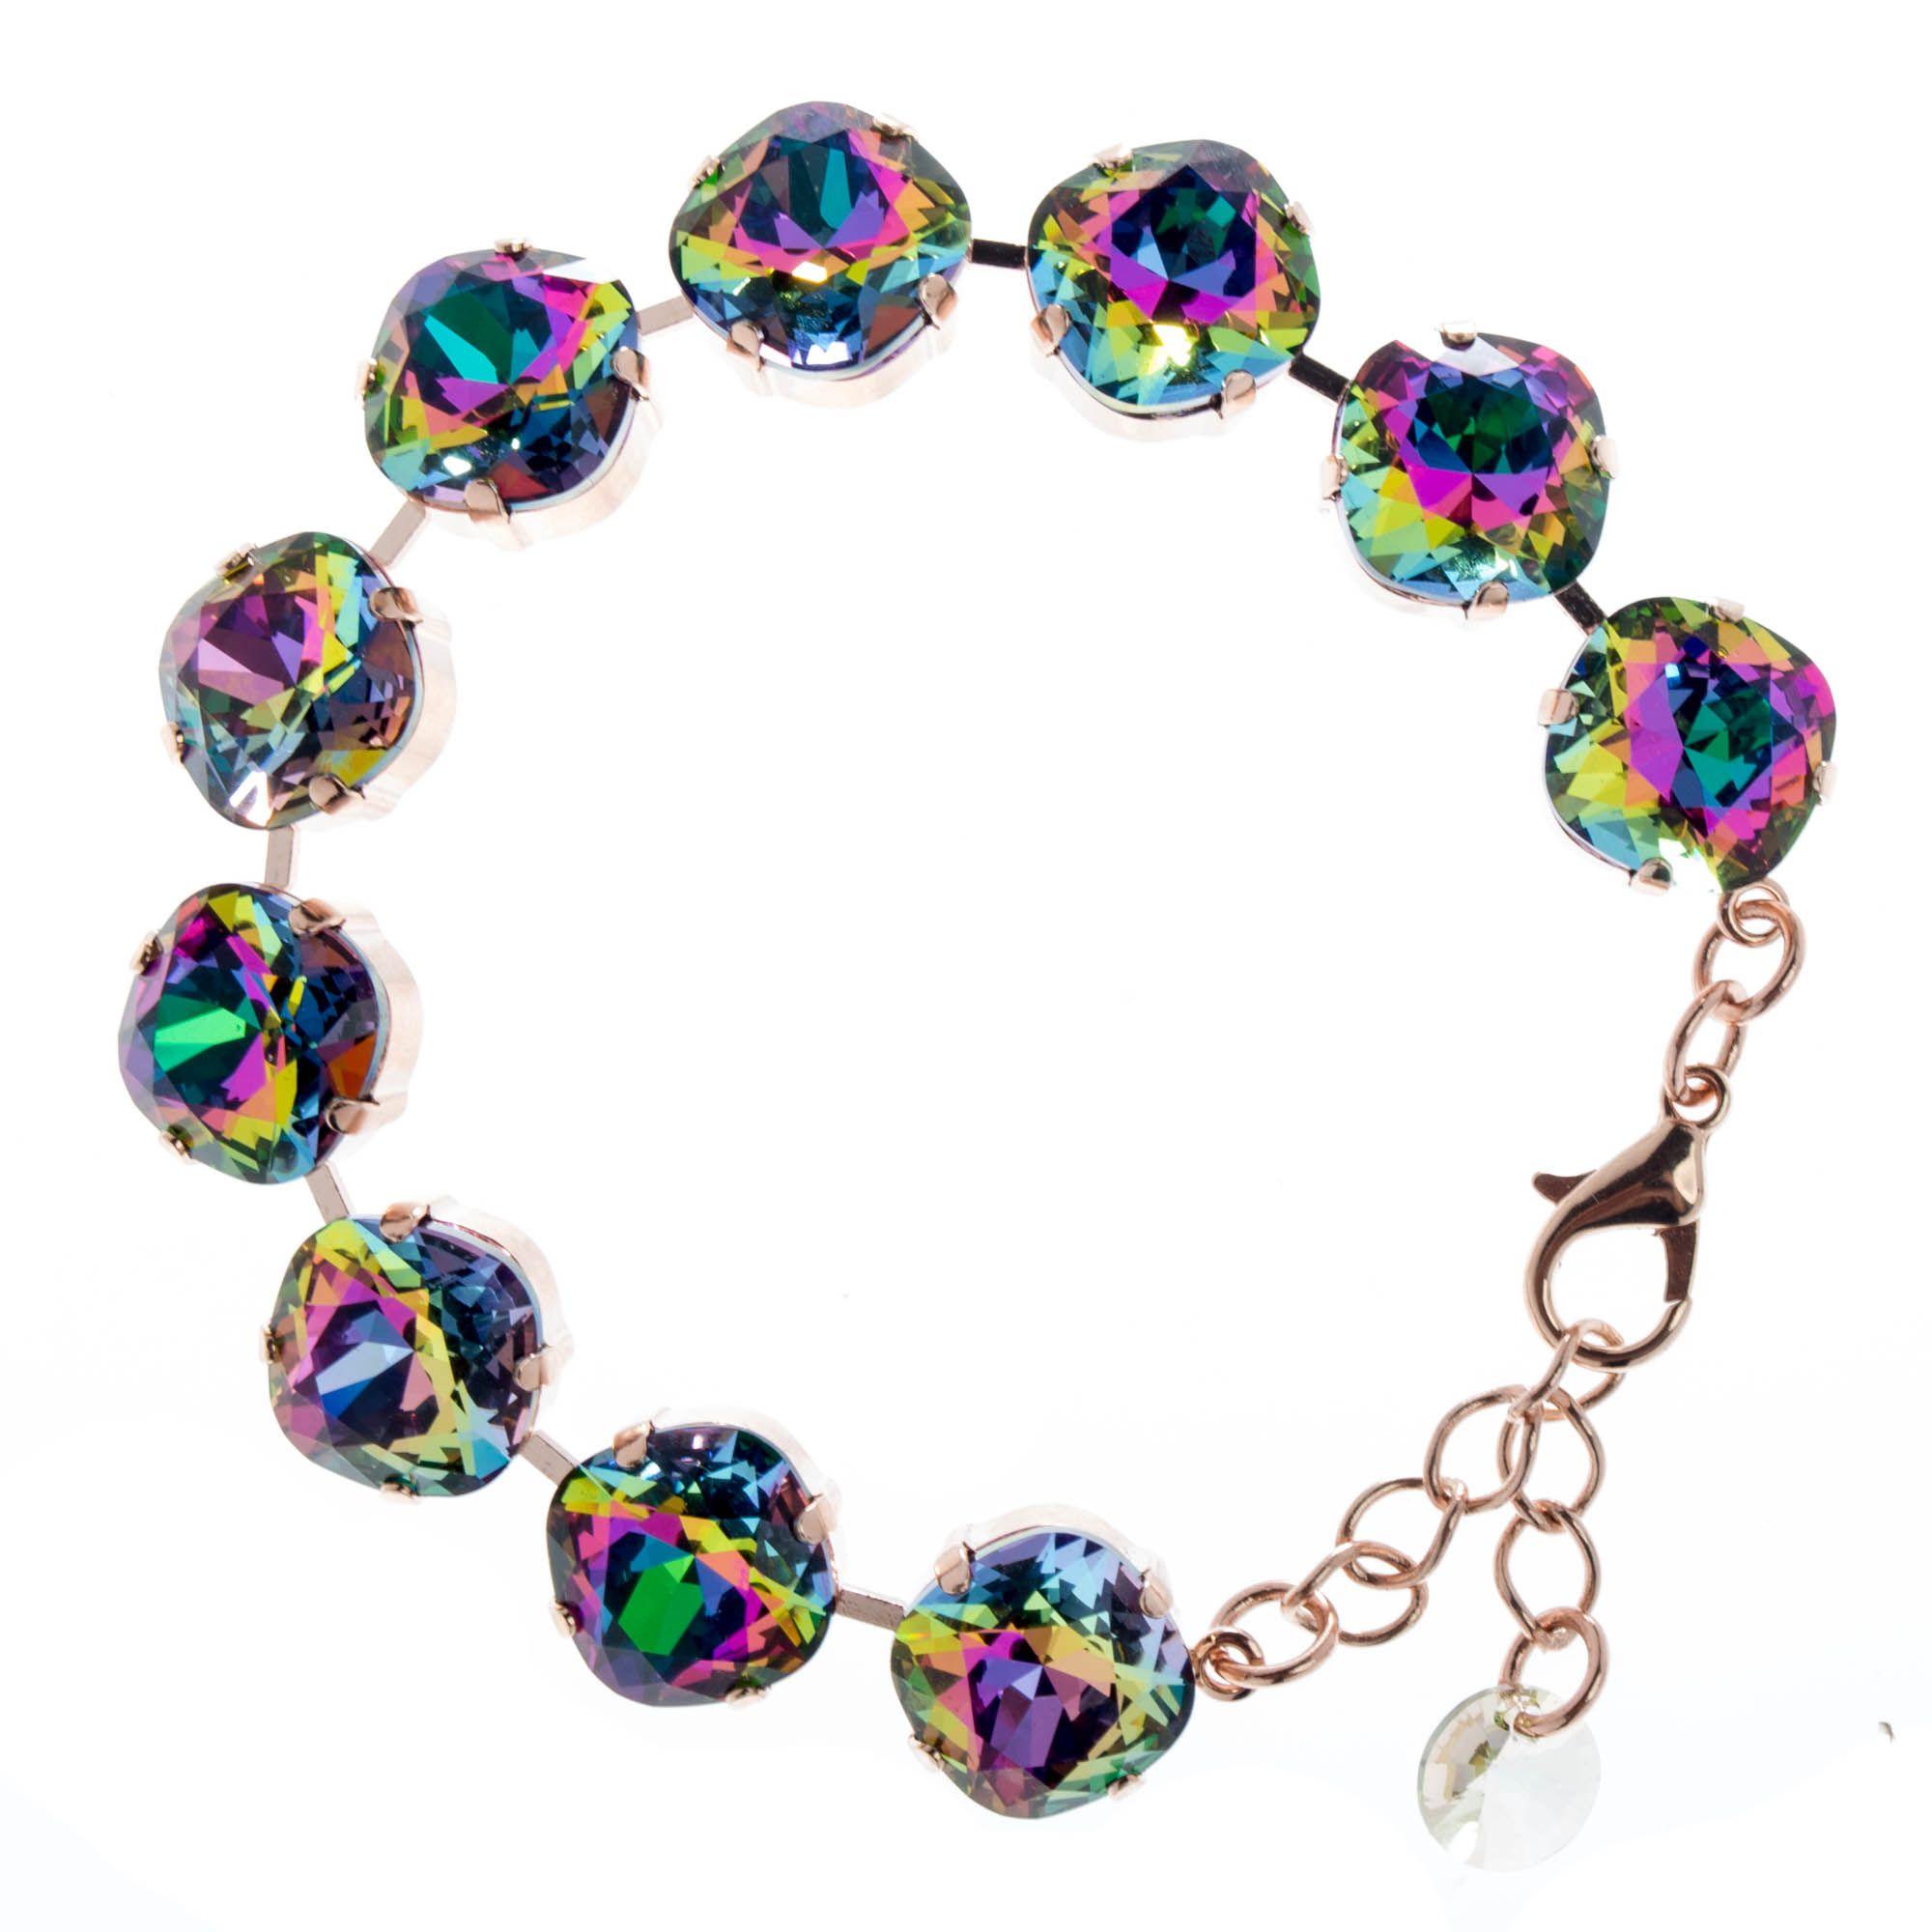 Lisa Marie Jewelry 12mm Square Swarovski Crystal Bracelet Electra